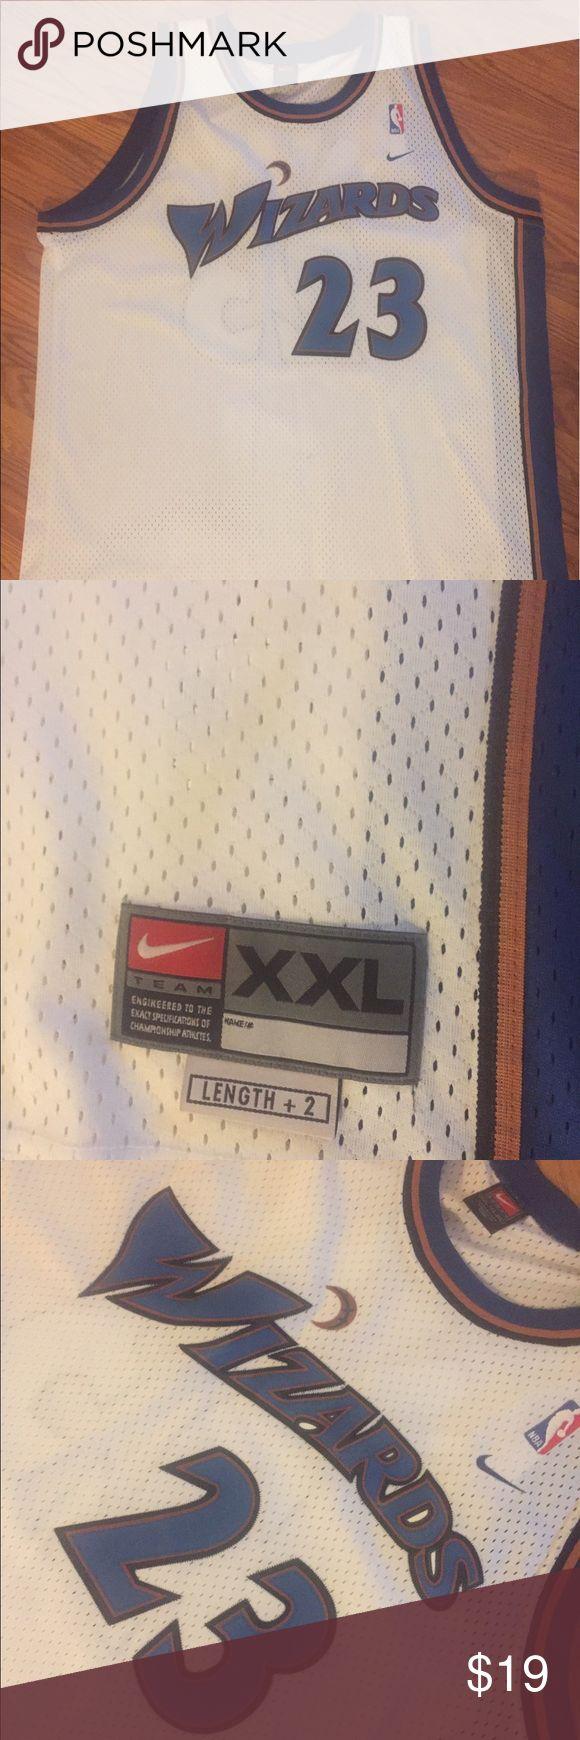 Nike - NBA Michael Jordan Wizards Jersey XXL Nike - NBA Michael Jordan Wizards Jersey XXL- Authentic Nike Other